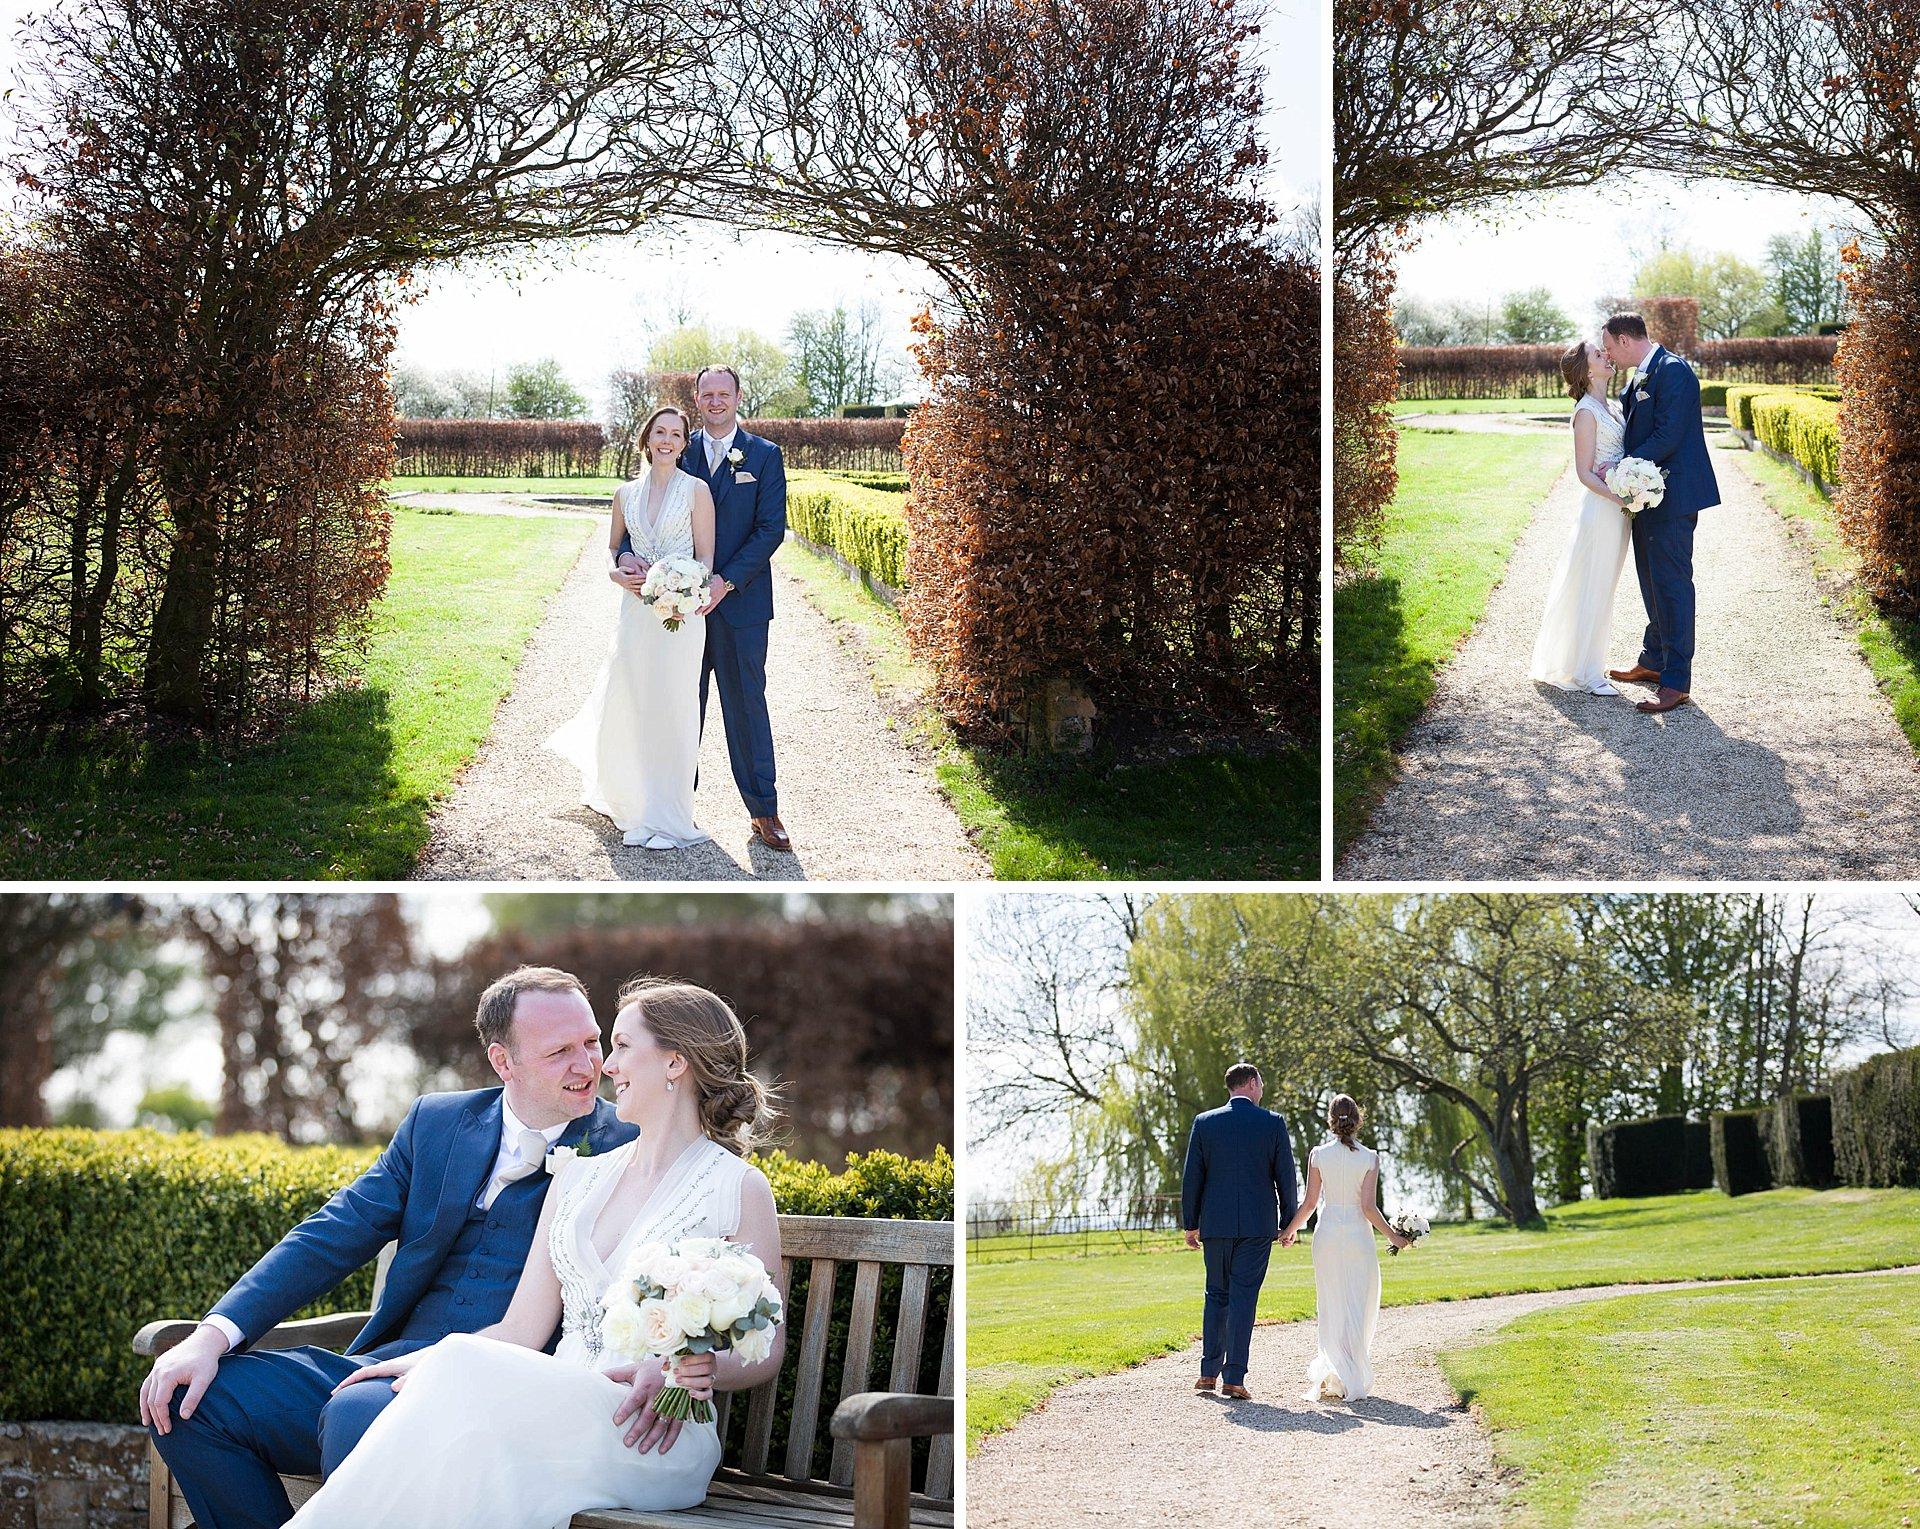 Wedding portraits at Poundon House